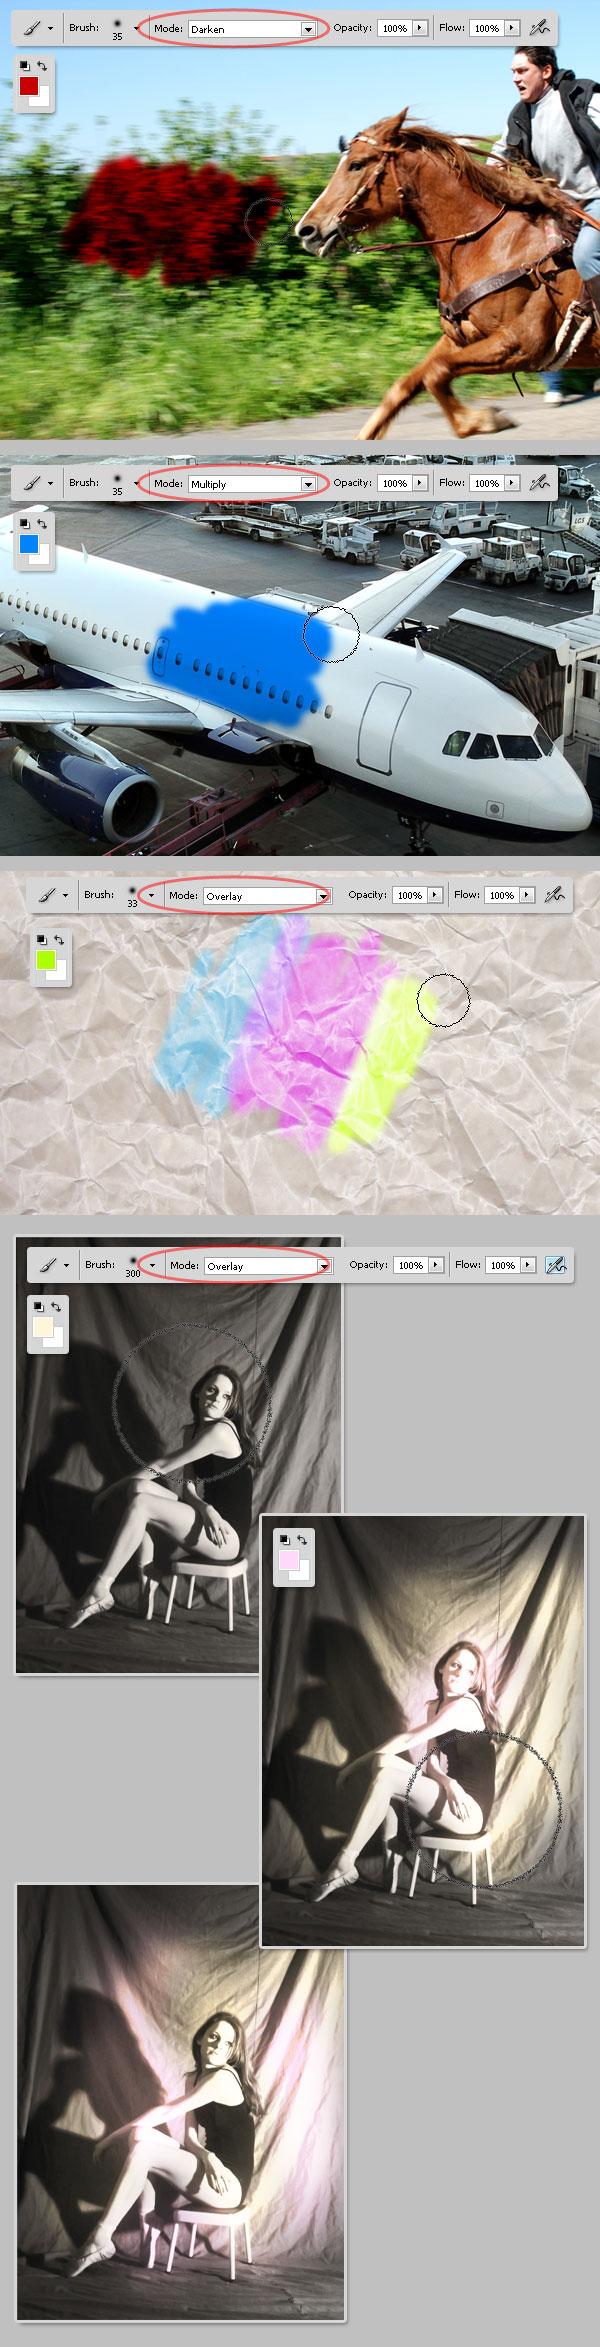 Photoshop Basics For Beginners Pdf